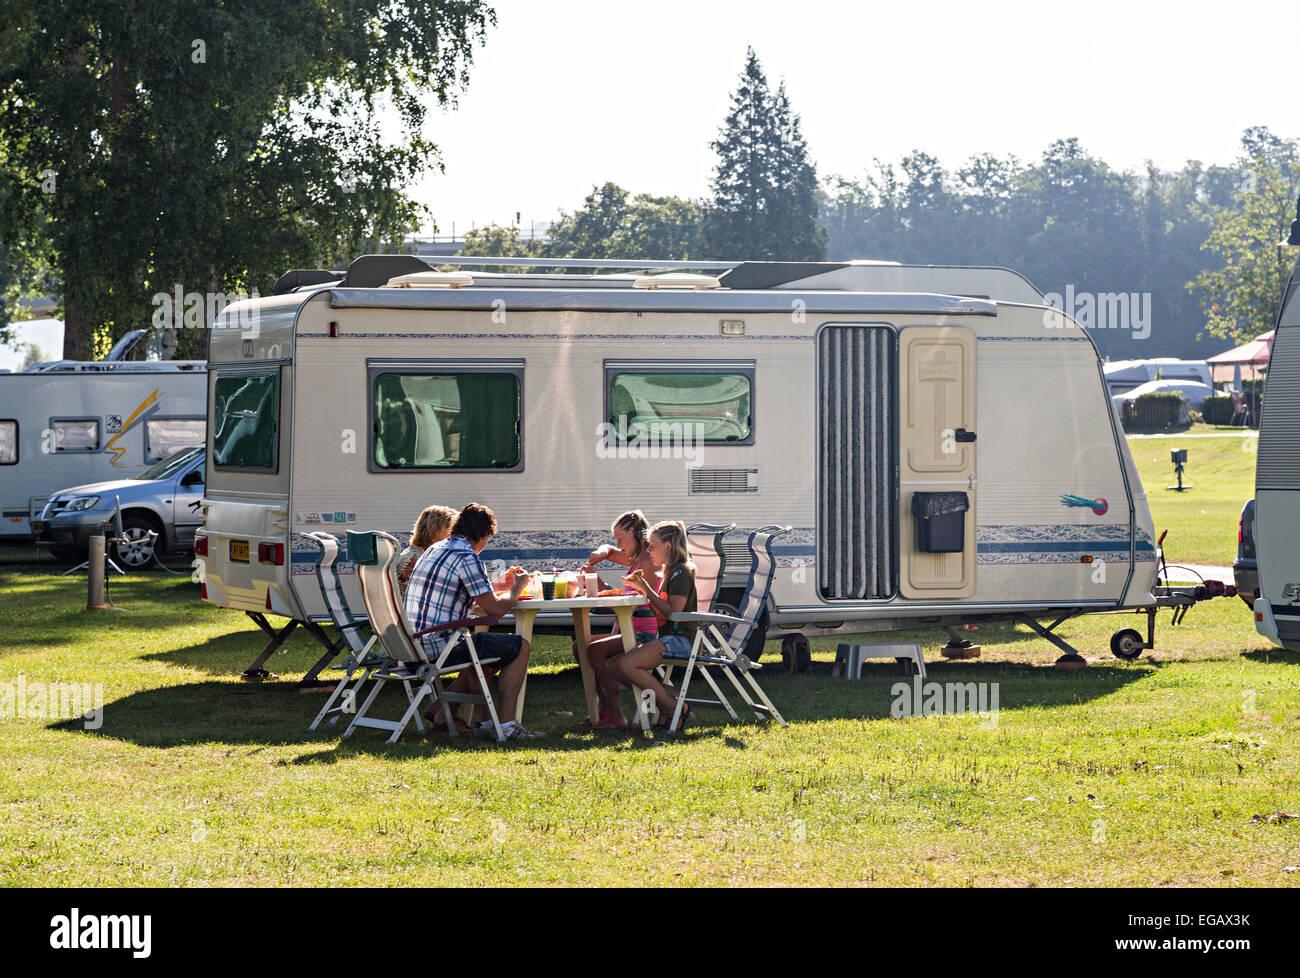 Bettingen camping equipment us based binary options companies registry